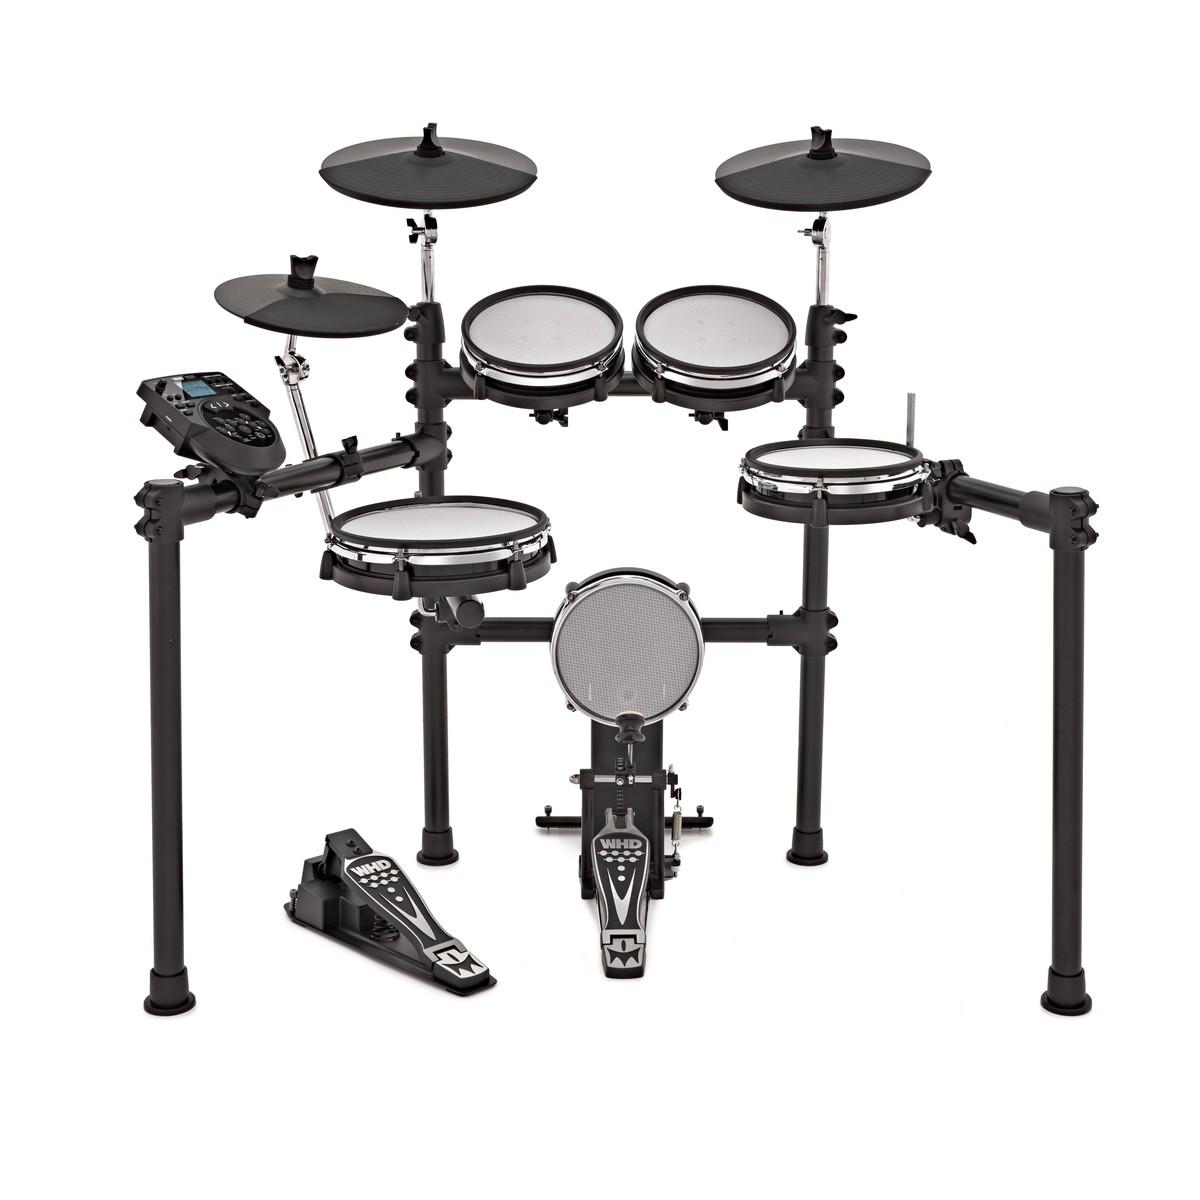 WHD 516-Pro Mesh Electronic Drum Kit - B-Stock